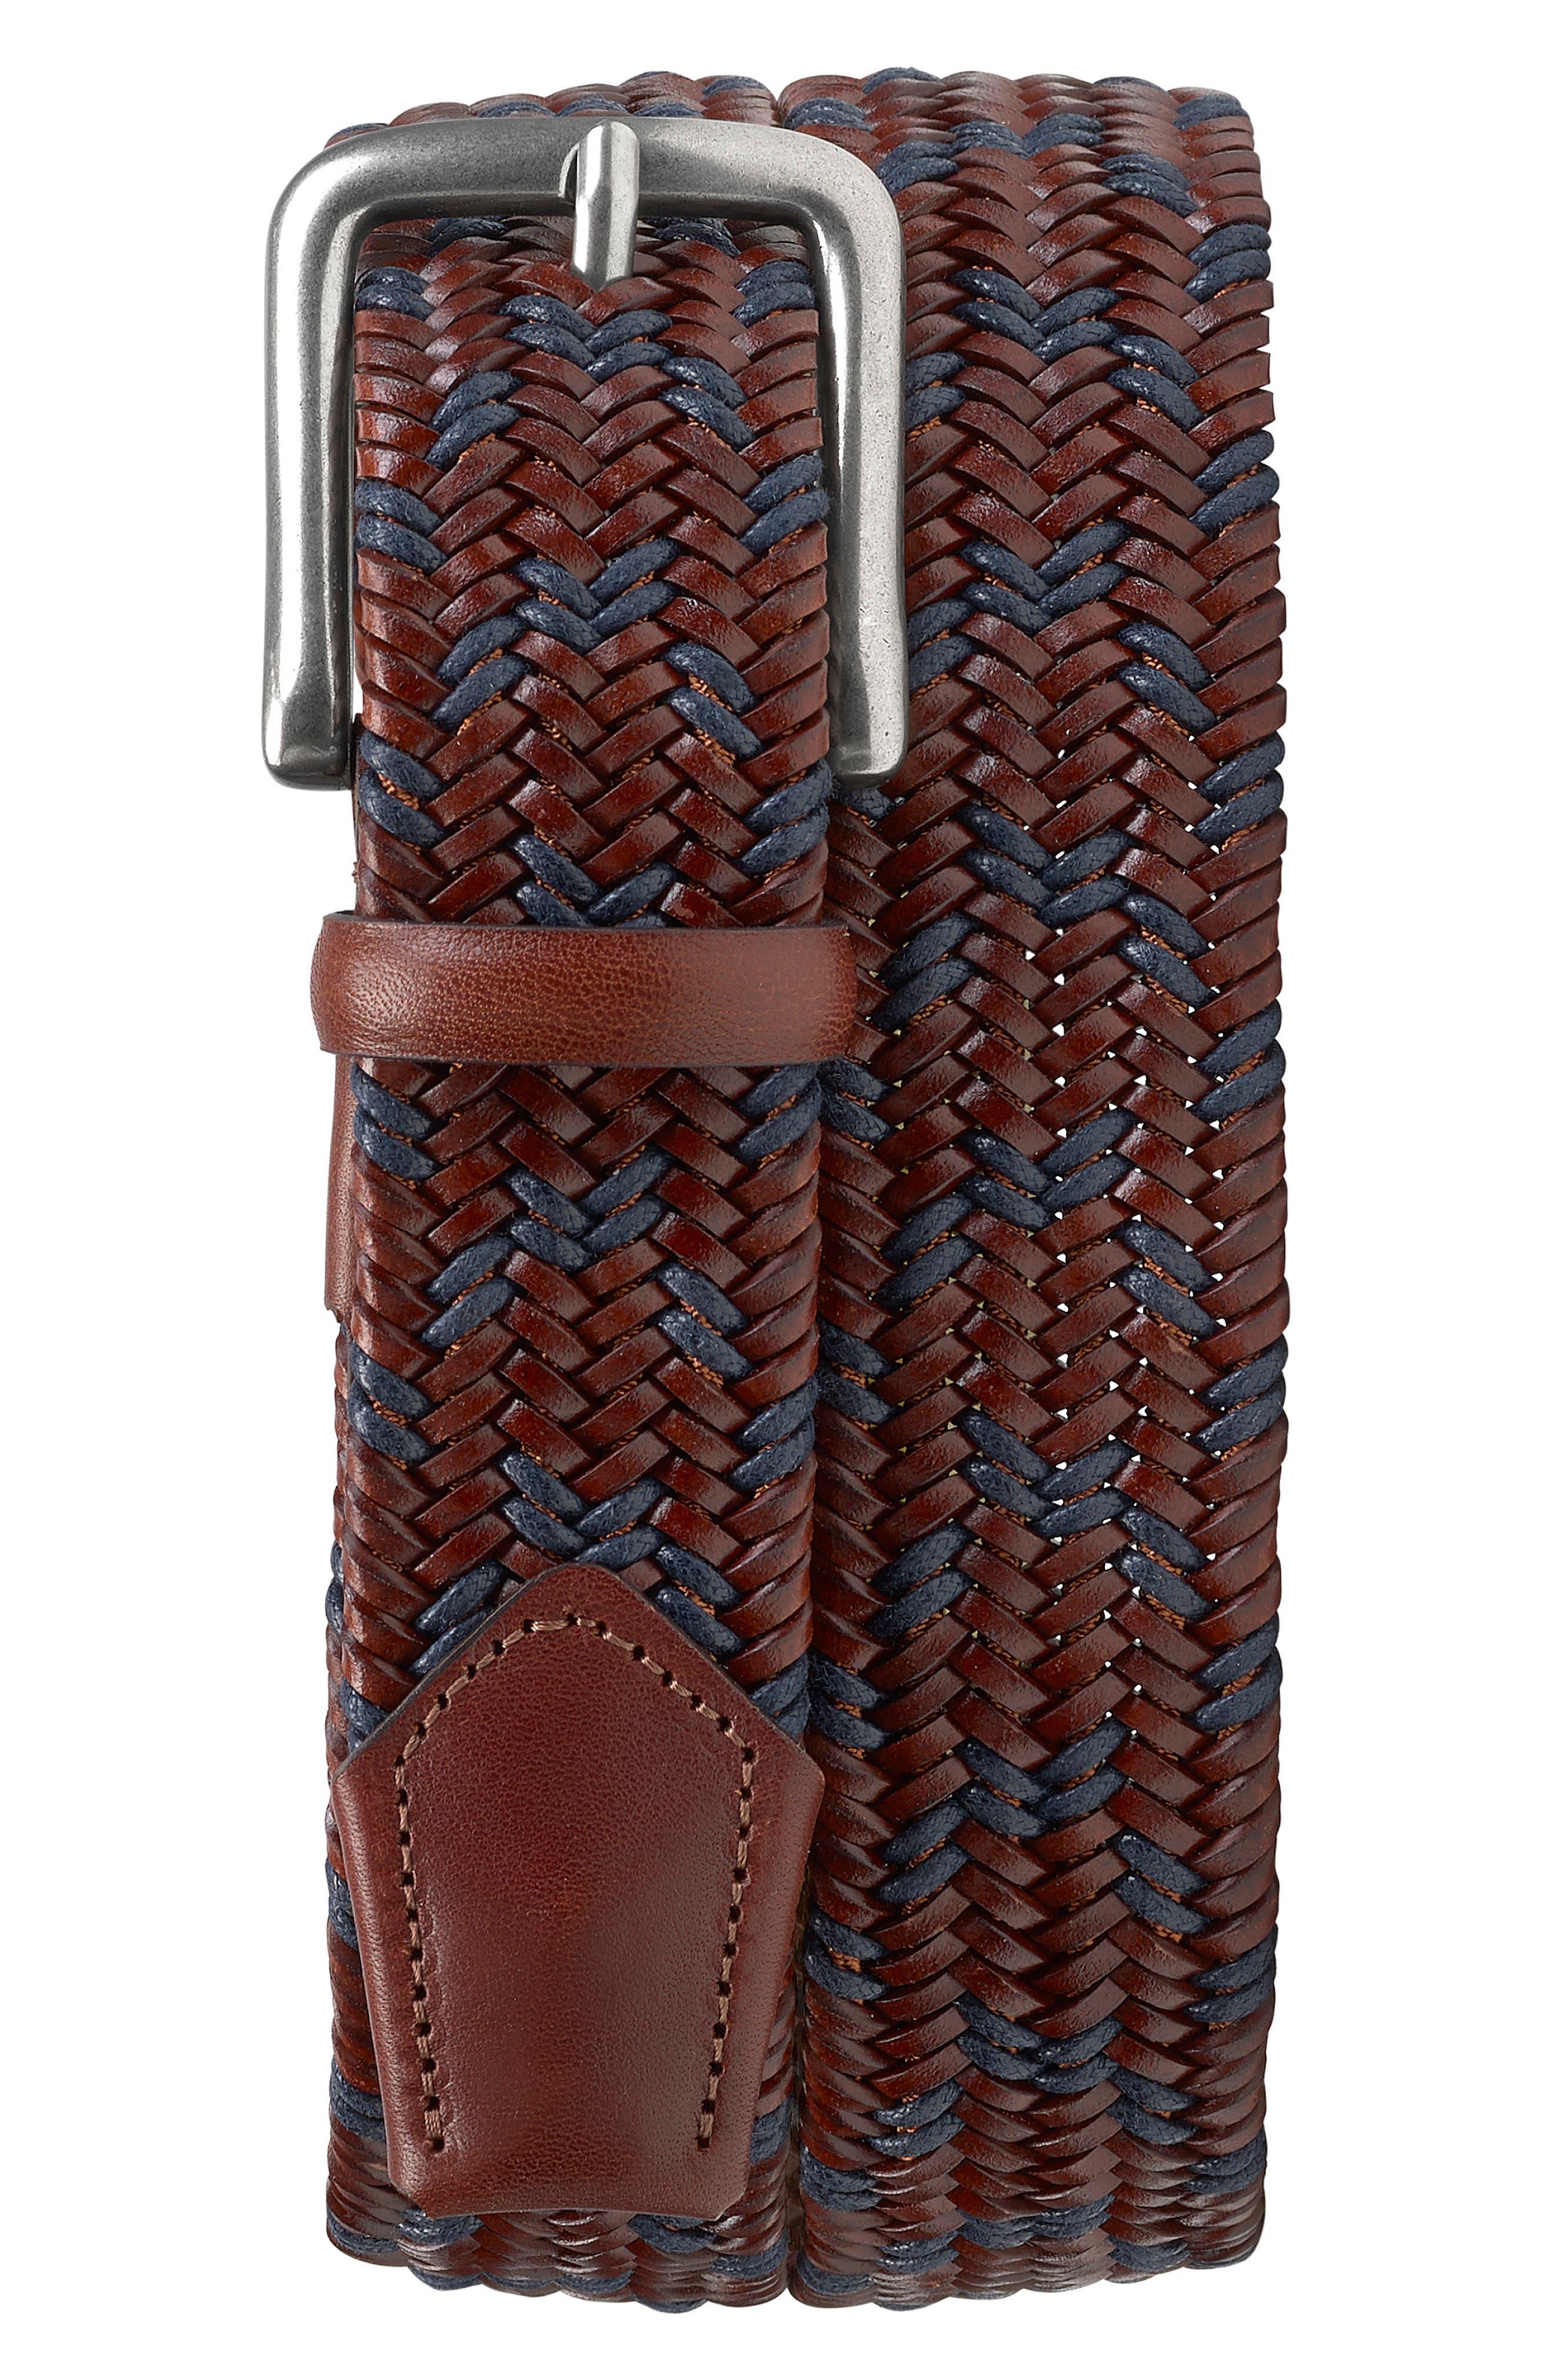 Trask Men's Trask Falcon Woven Belt, Size 36 - Redwood/ Navy